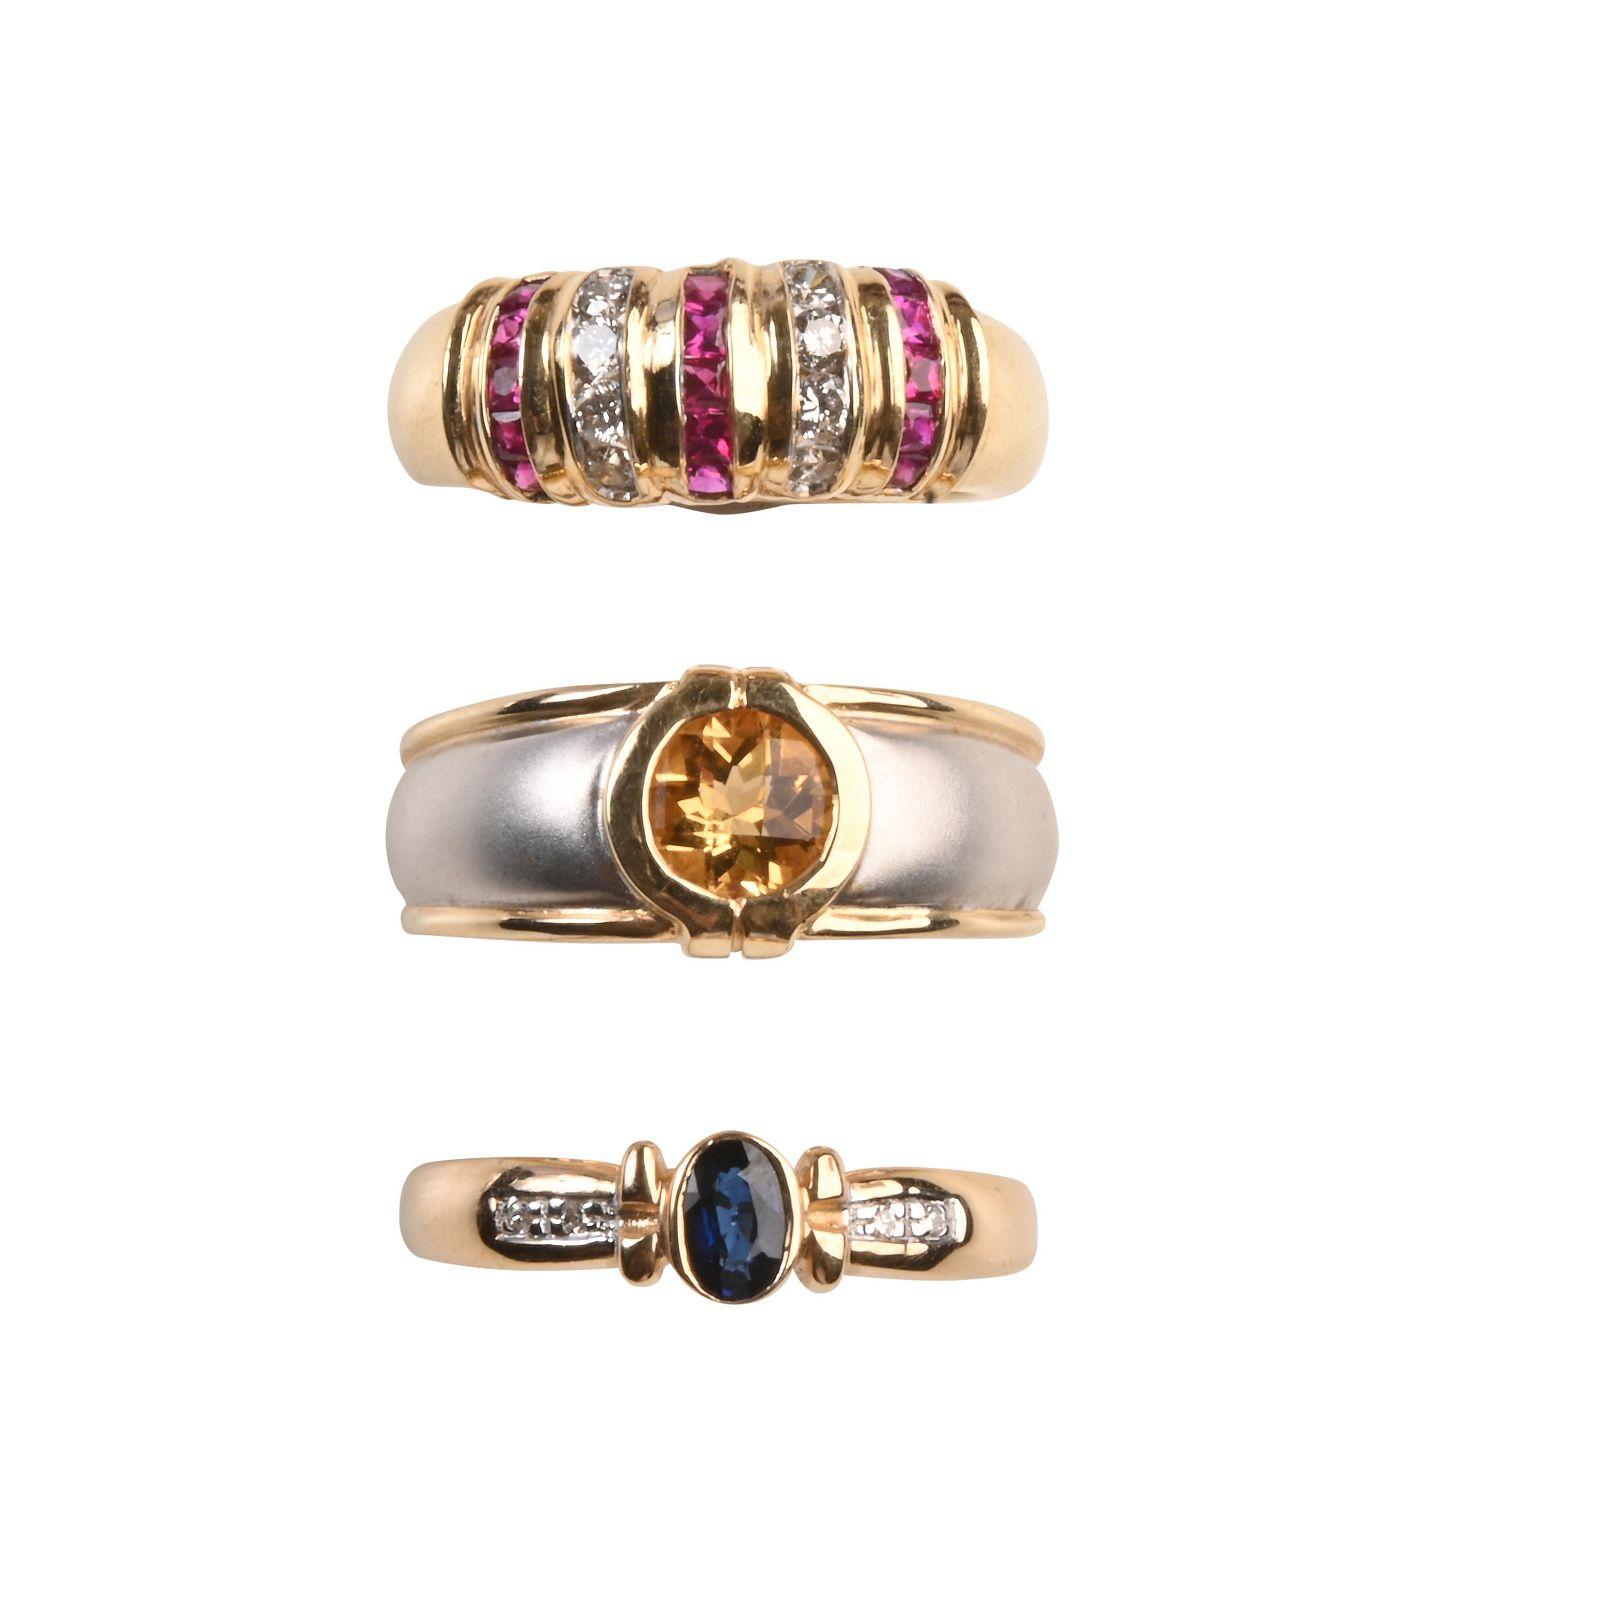 Collection of Three Multi-Stone, Diamond, 14k Yellow